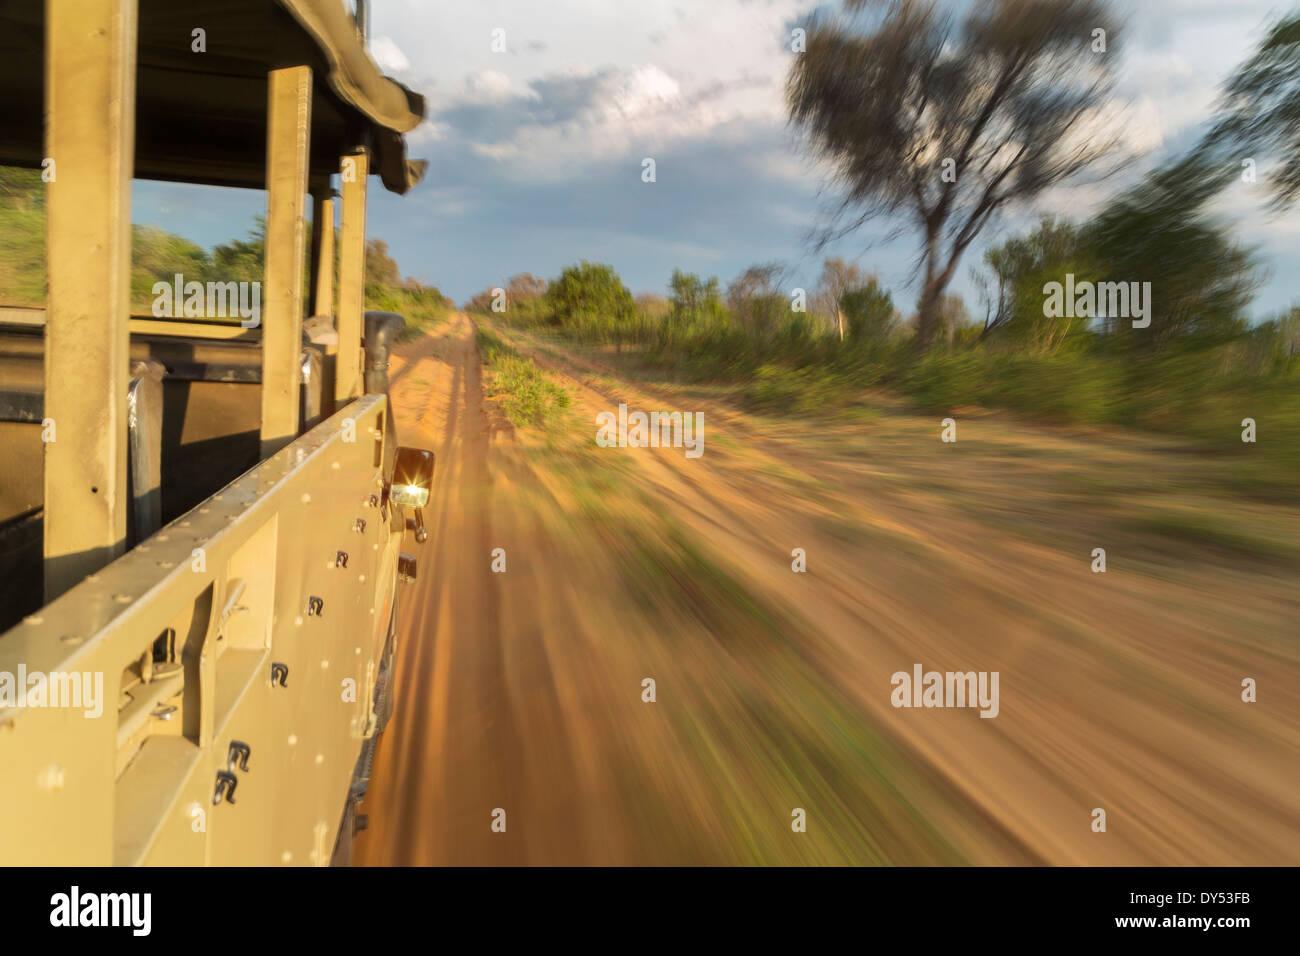 Safari truck speeding along dirt road, Kasane, Chobe National Park, Botswana, Africa - Stock Image